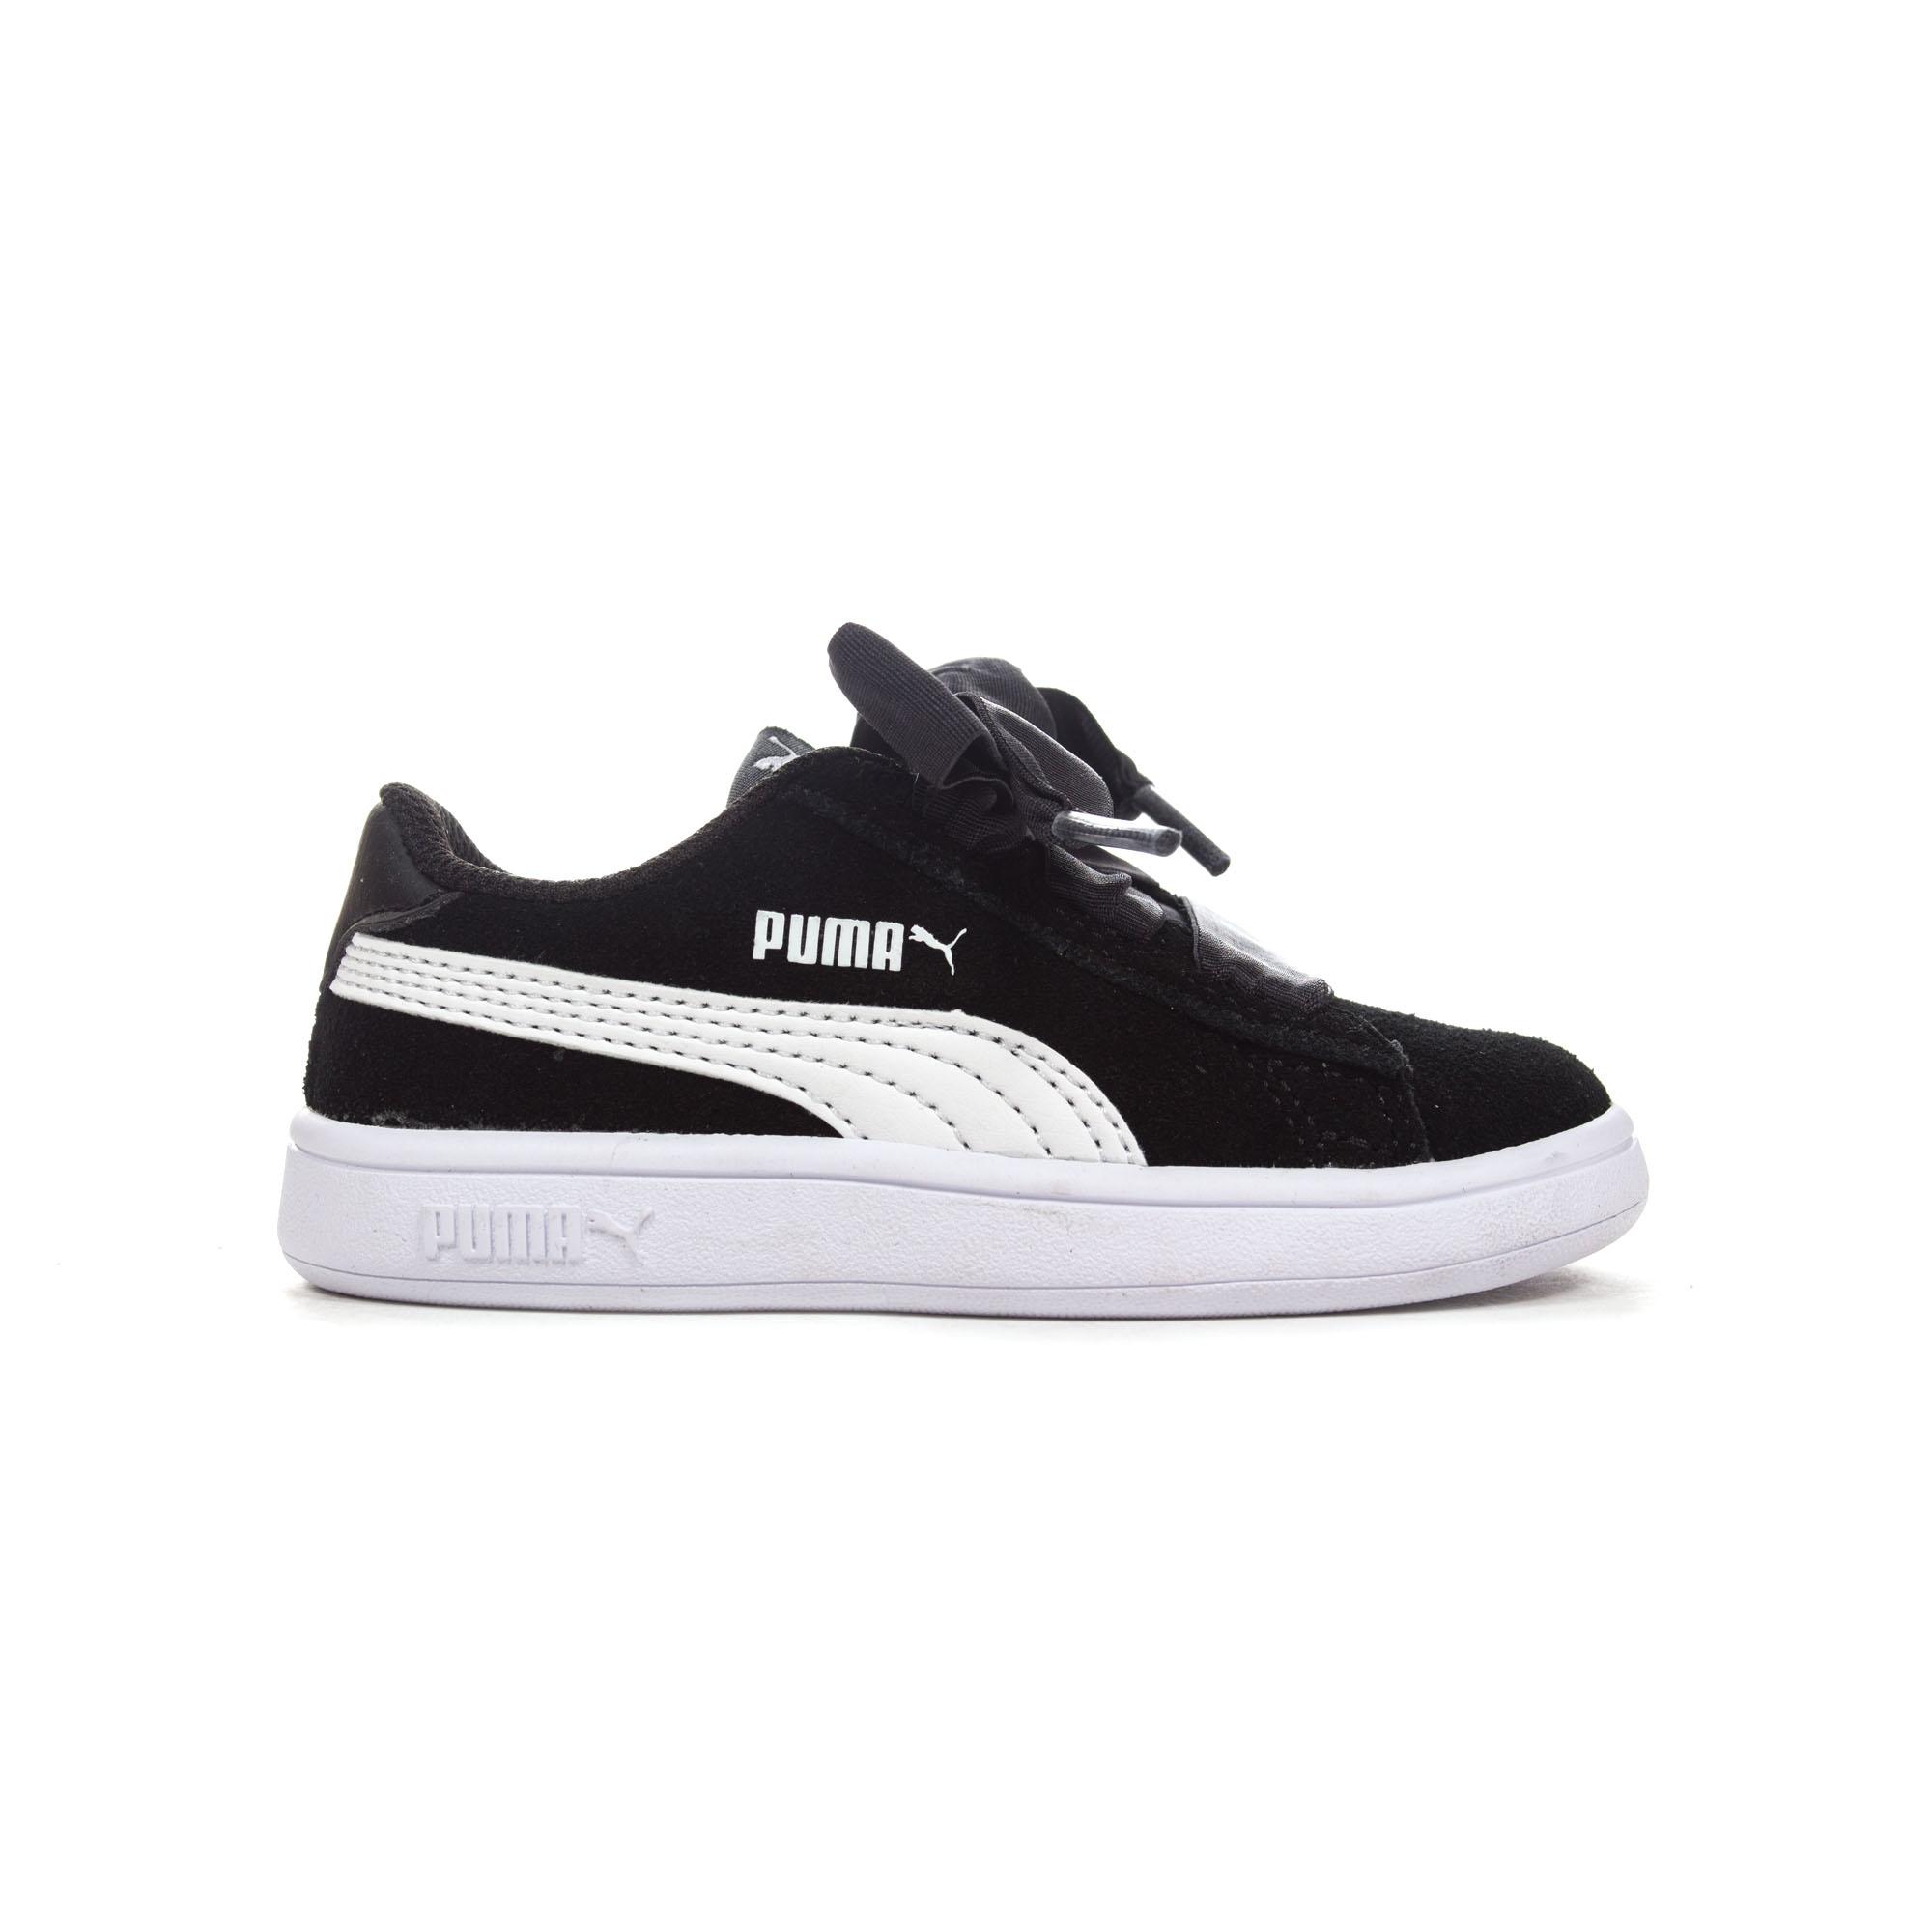 49e2bba1d59 Details about Puma Smash V2 Ribbon Suede Infant Girls Trainer Shoe Black  White